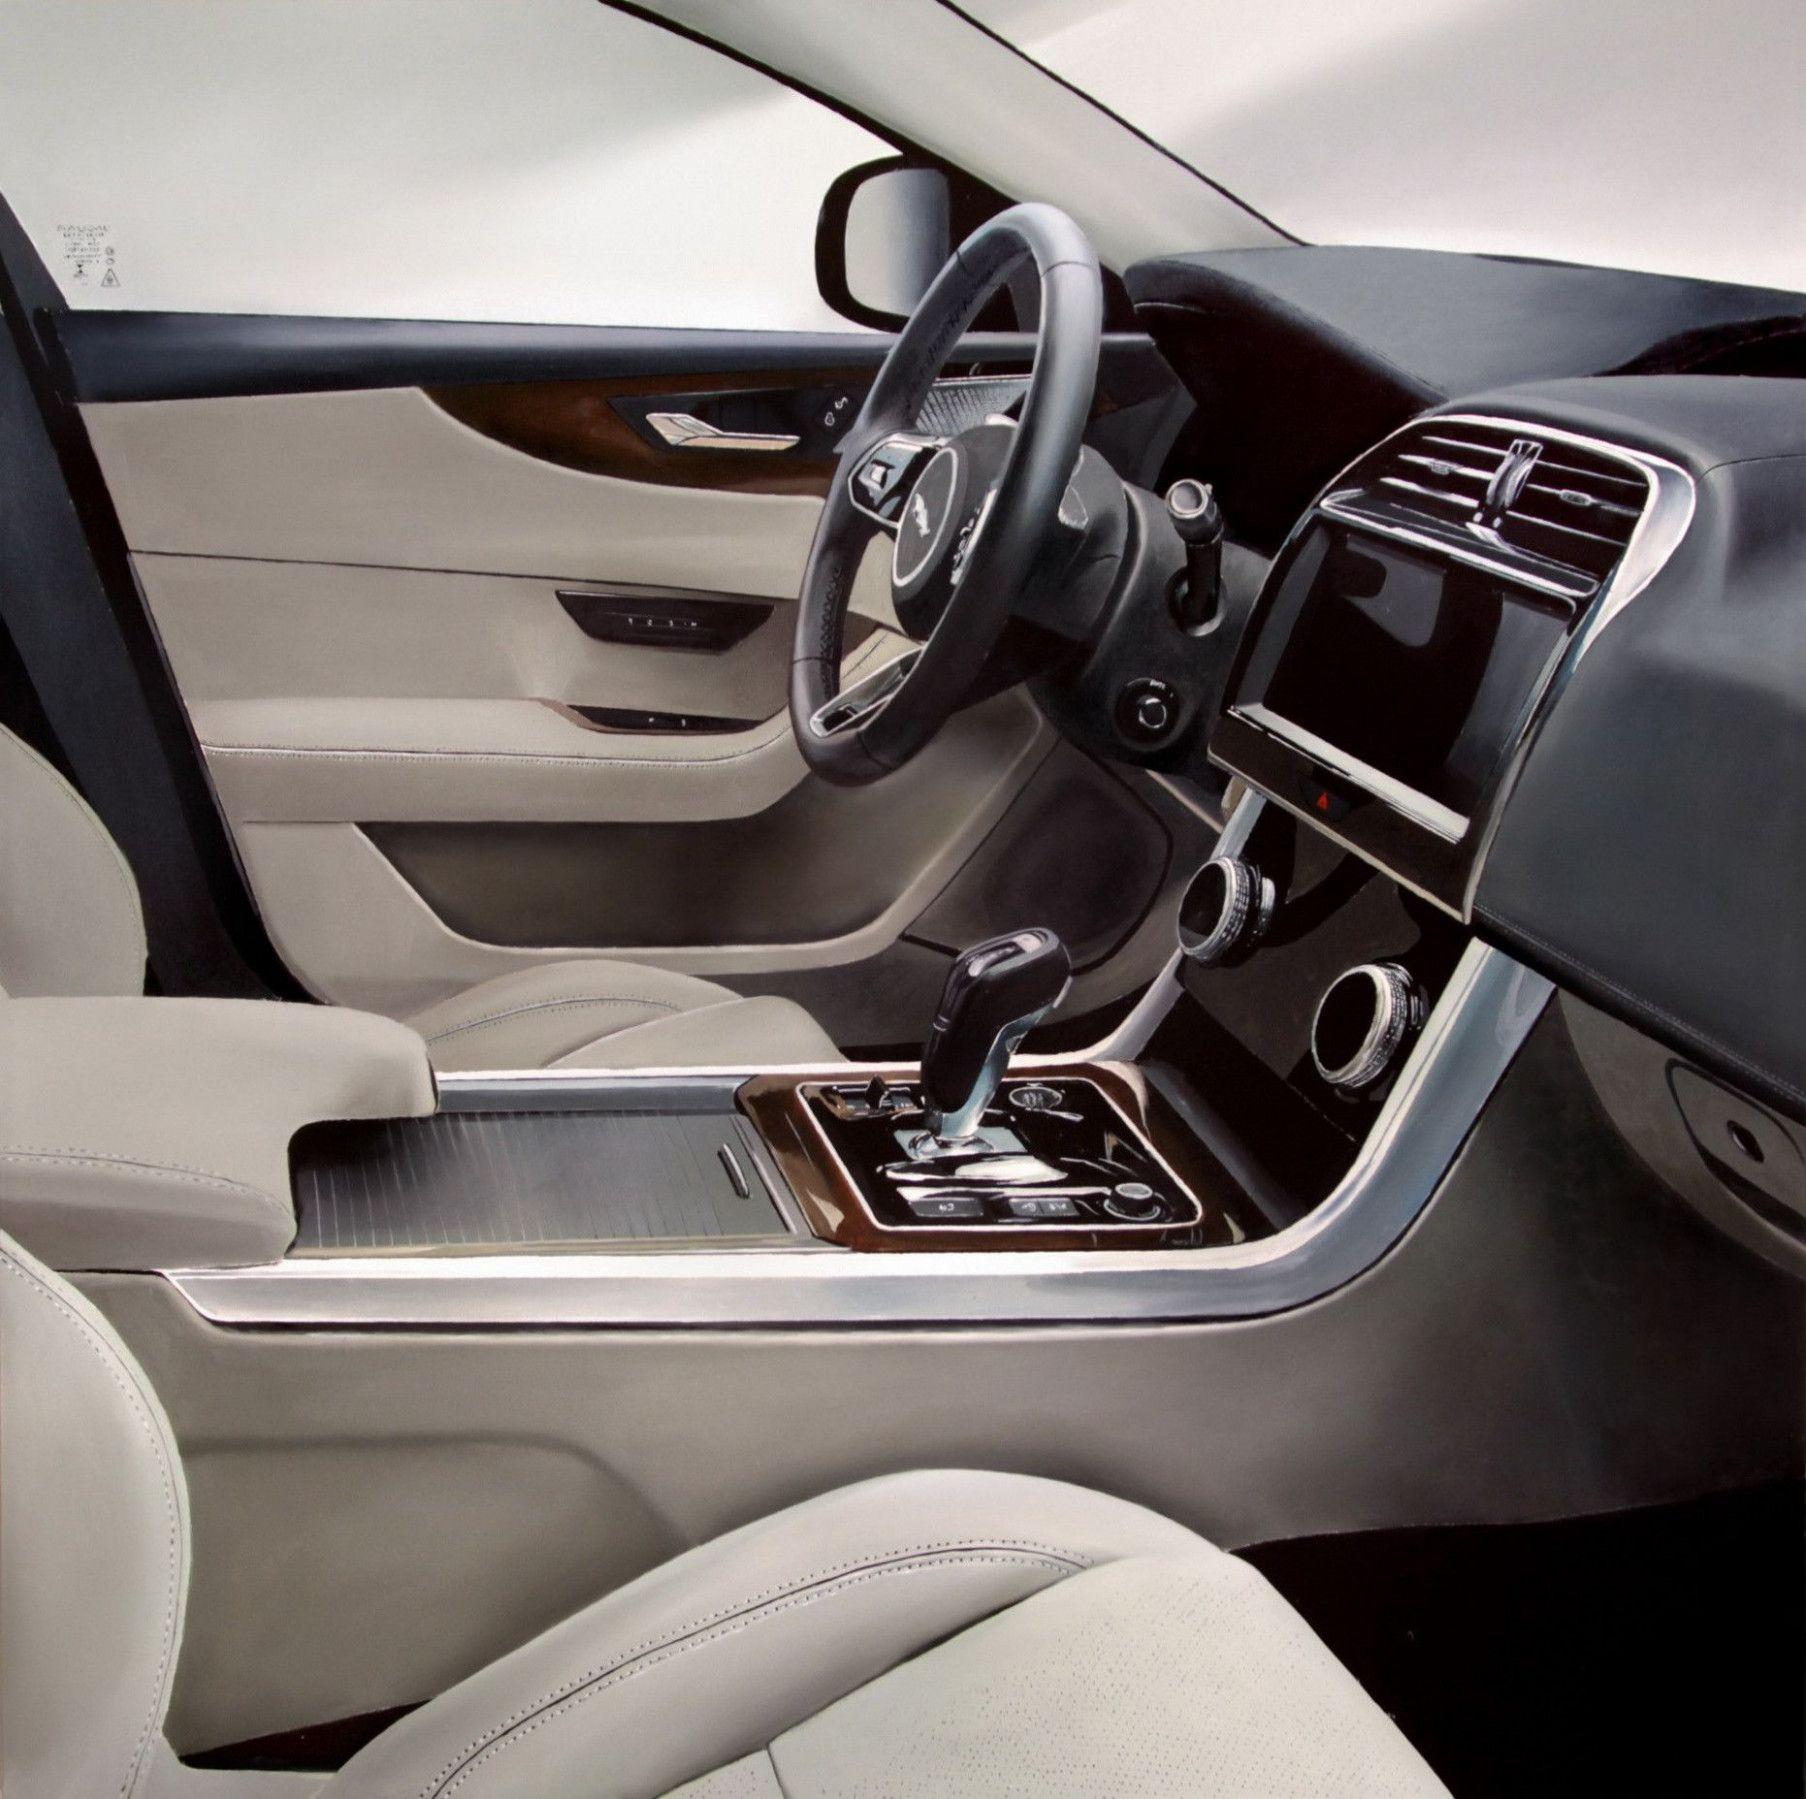 2020 jaguar f type interior redesign di 2020